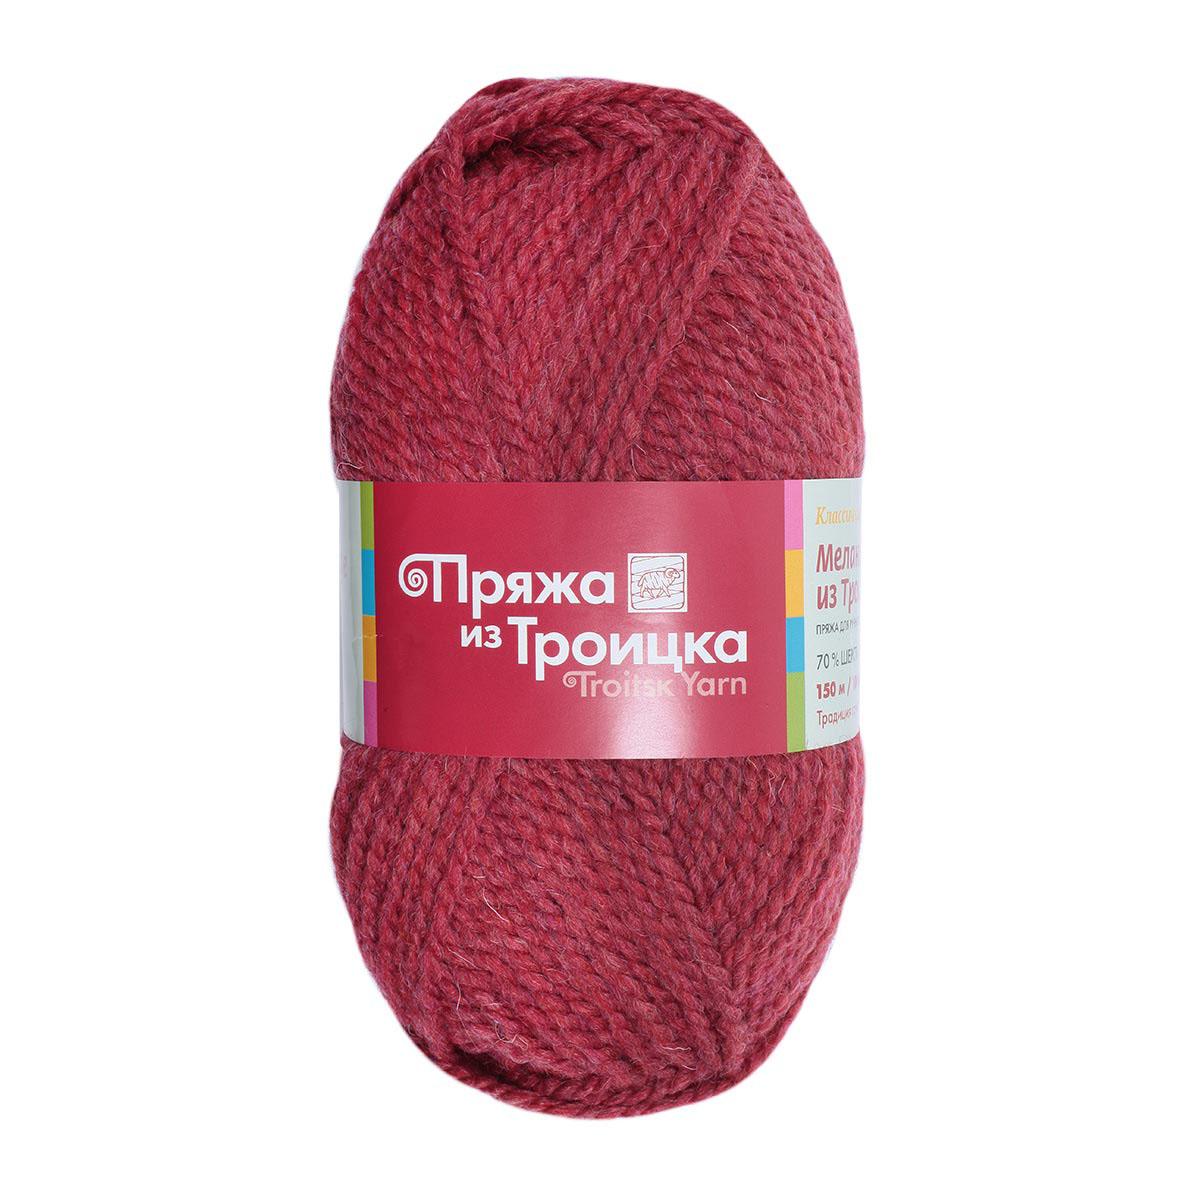 Пряжа из Троицка 'Меланж из Троицка' (70%шерсть, 30%акрил) (8057 меланж (ягода)) фото